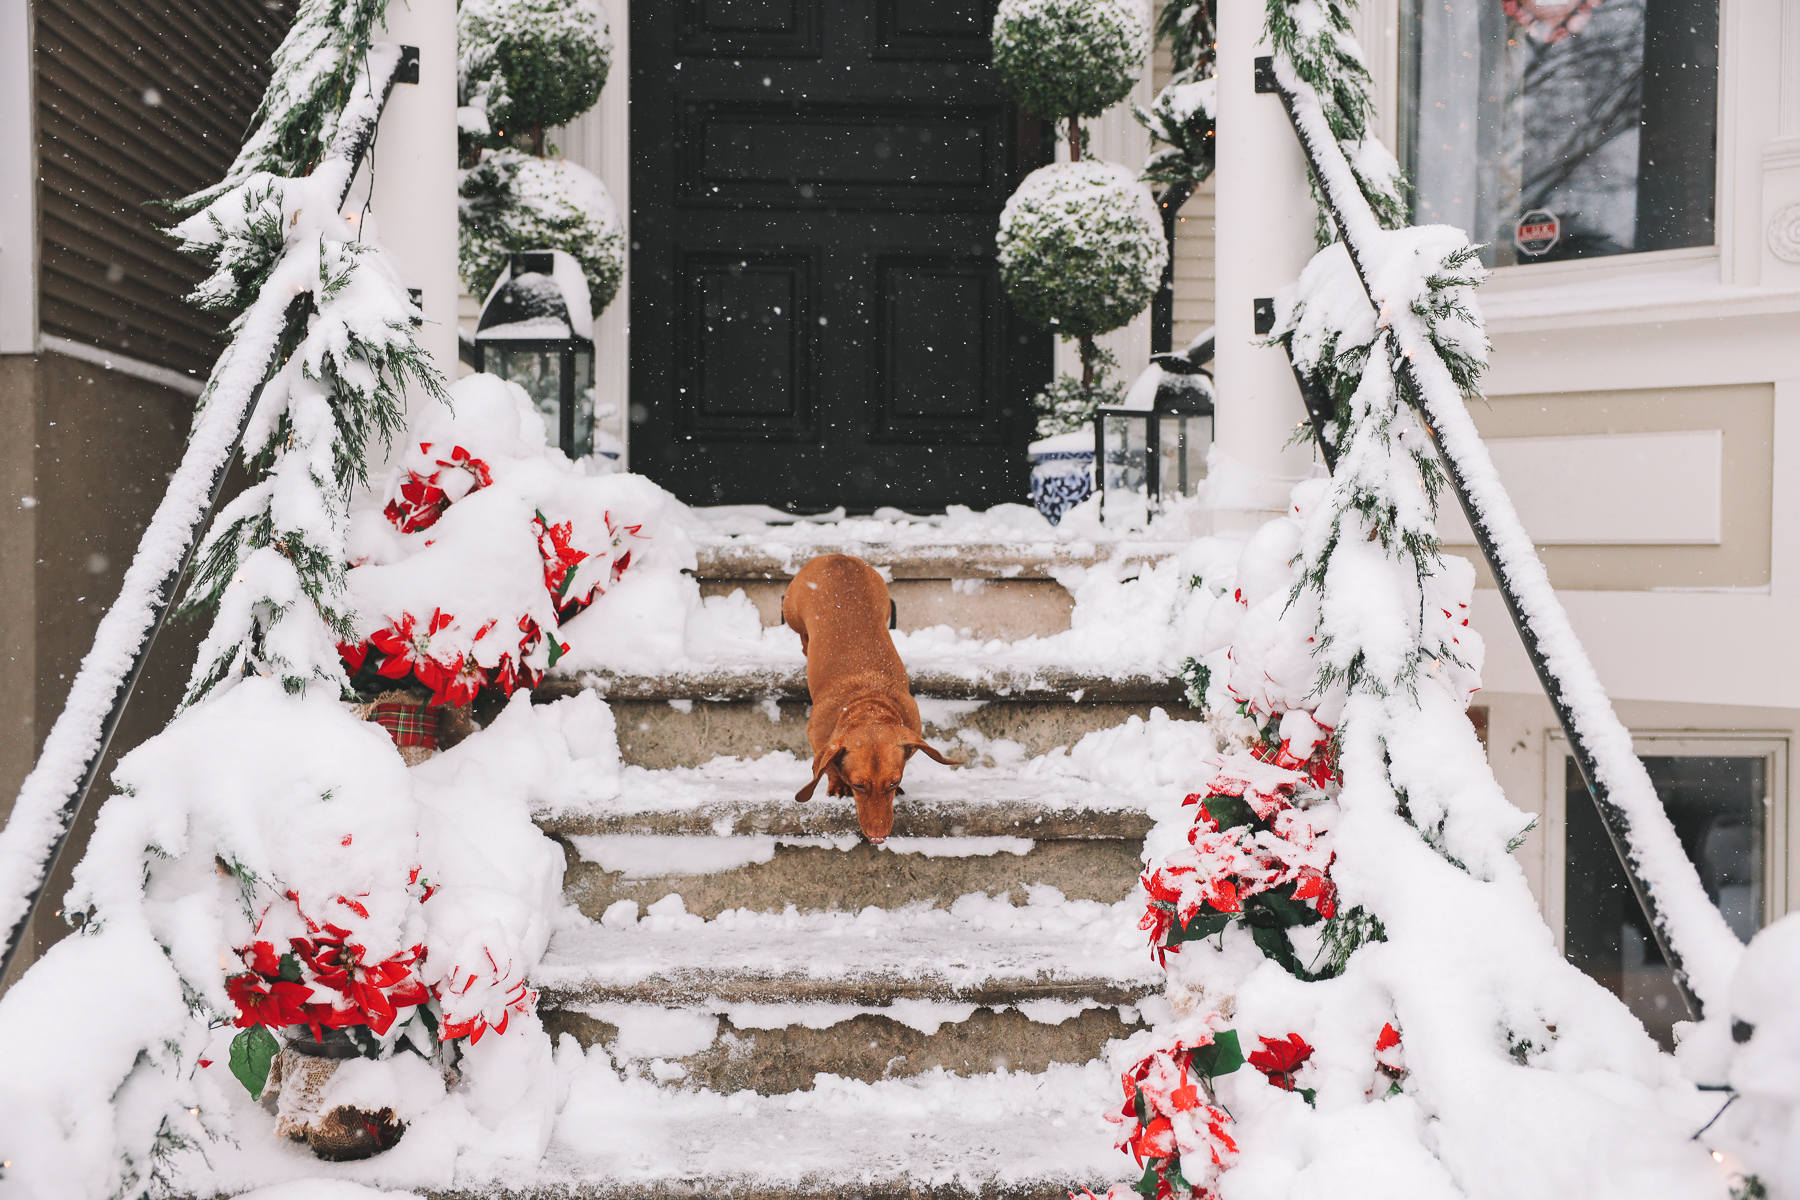 chicago house snow